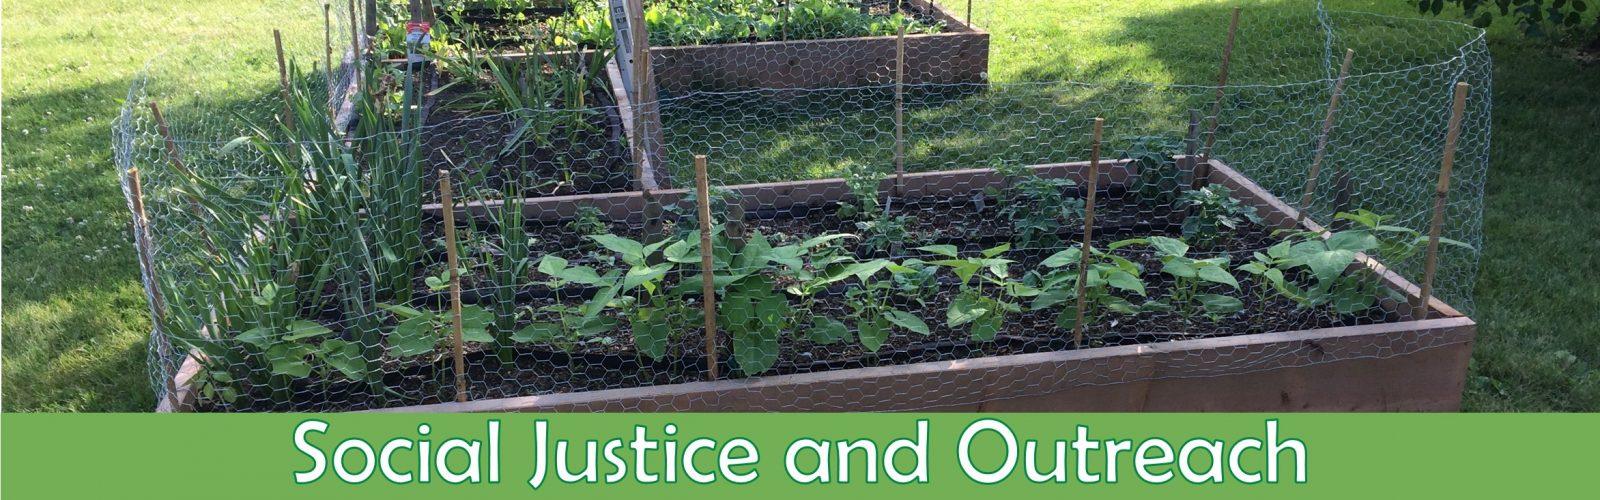 Banner-Slider Social Justice & Outreach Community Garden